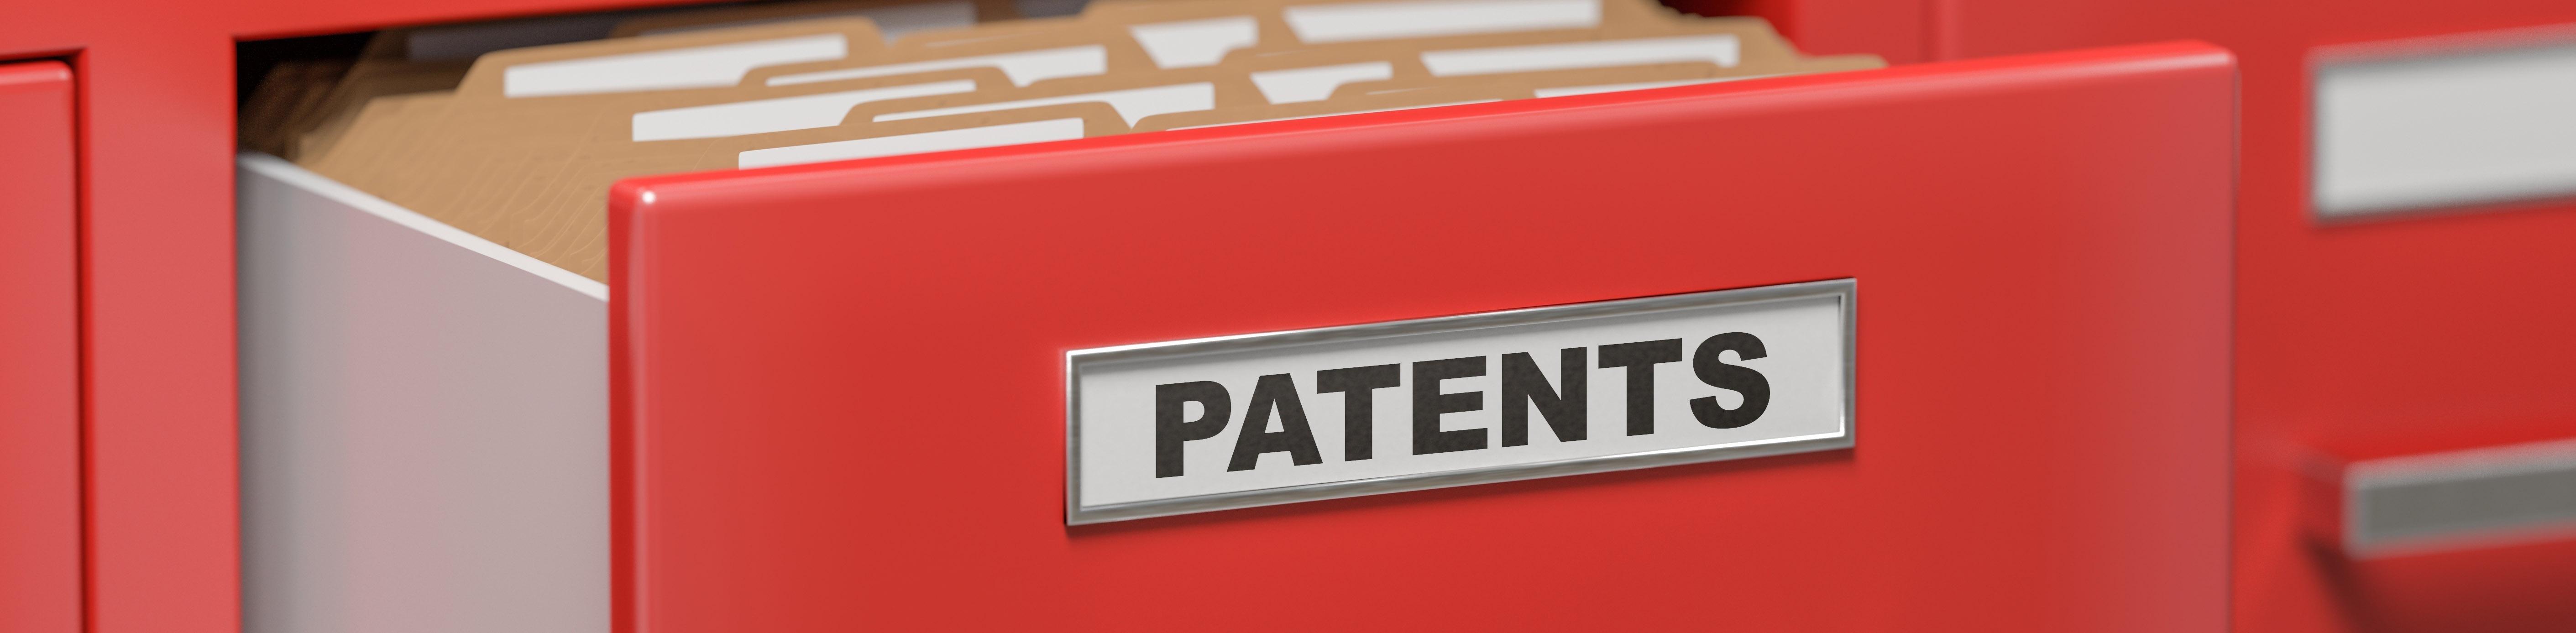 PatentsandNativeAmericanshero